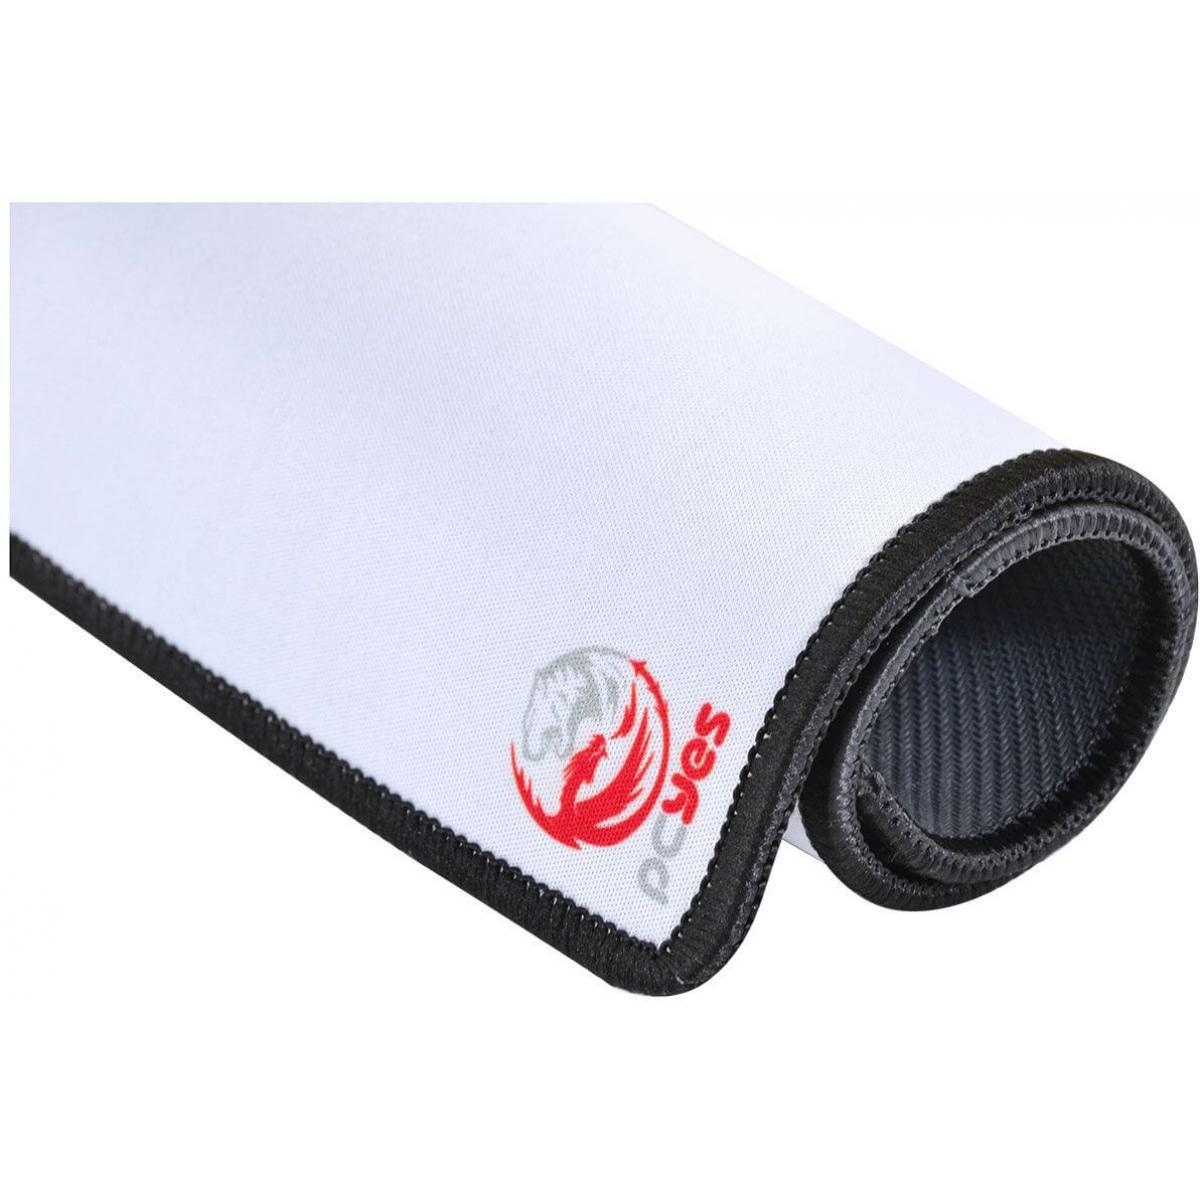 Mouse Pad Gamer PCyes Huebr Branco Standard Borda Costurada HBS36X30